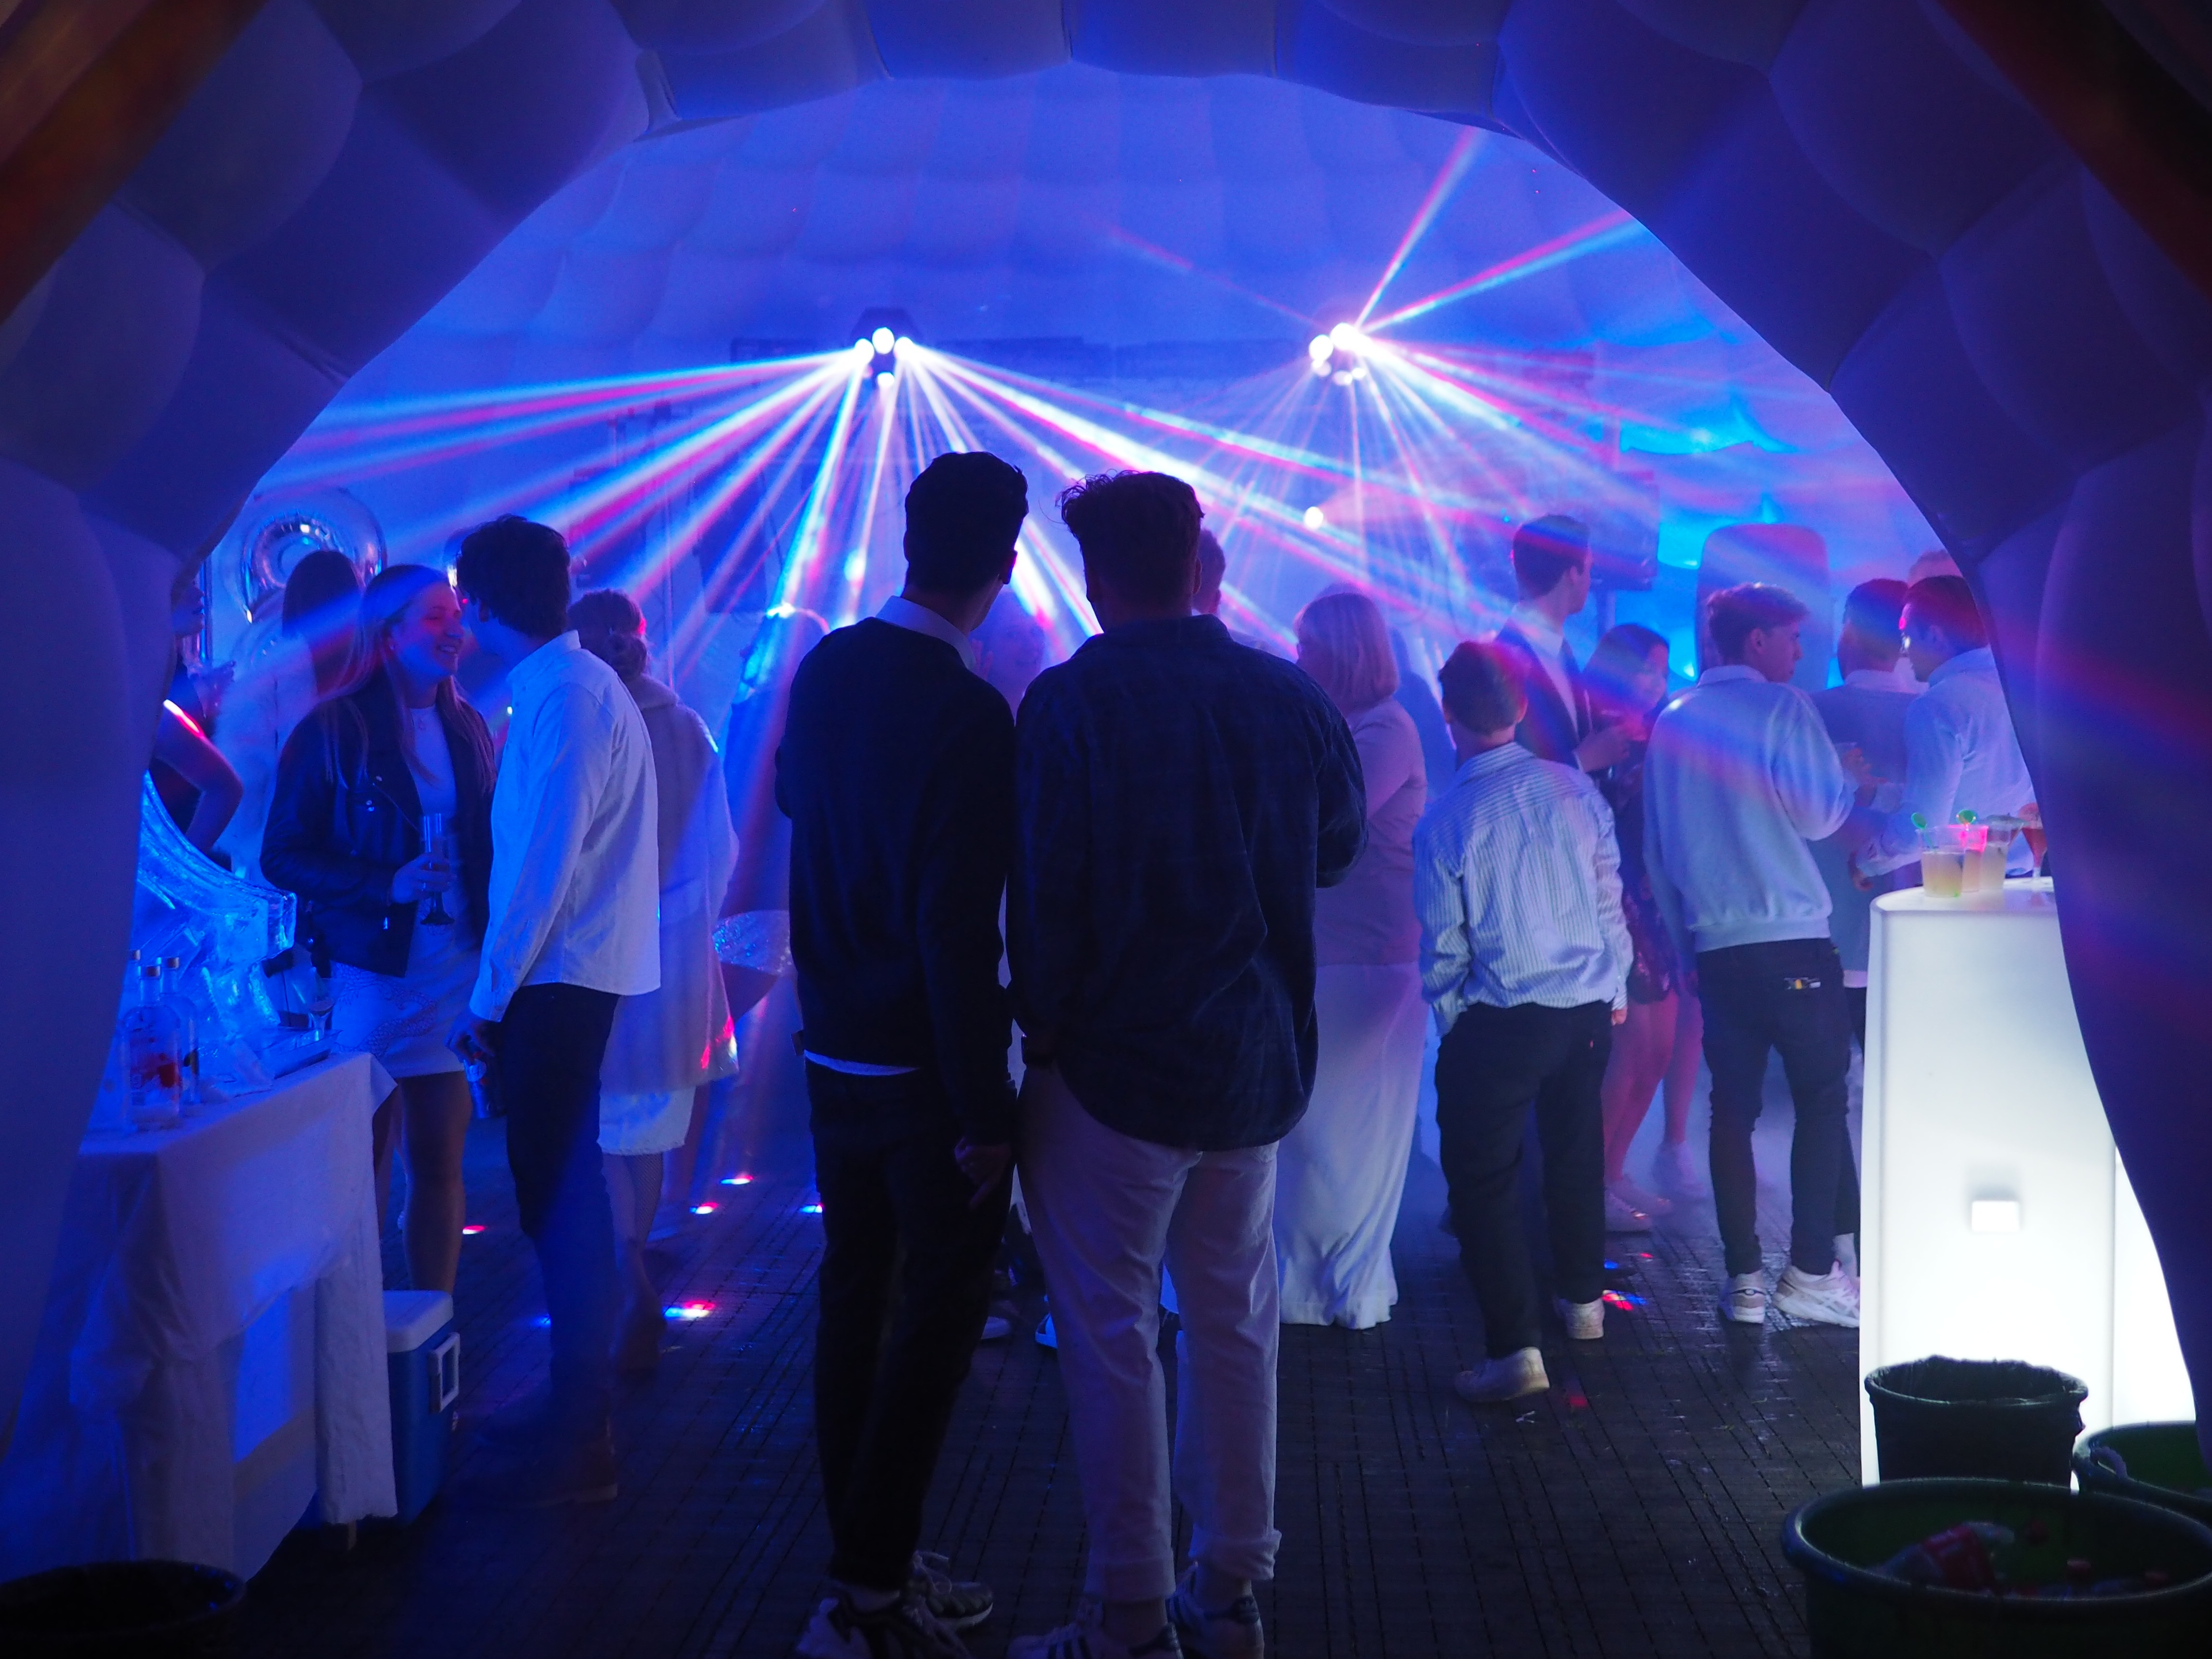 people inside an igloo shadows.jpg